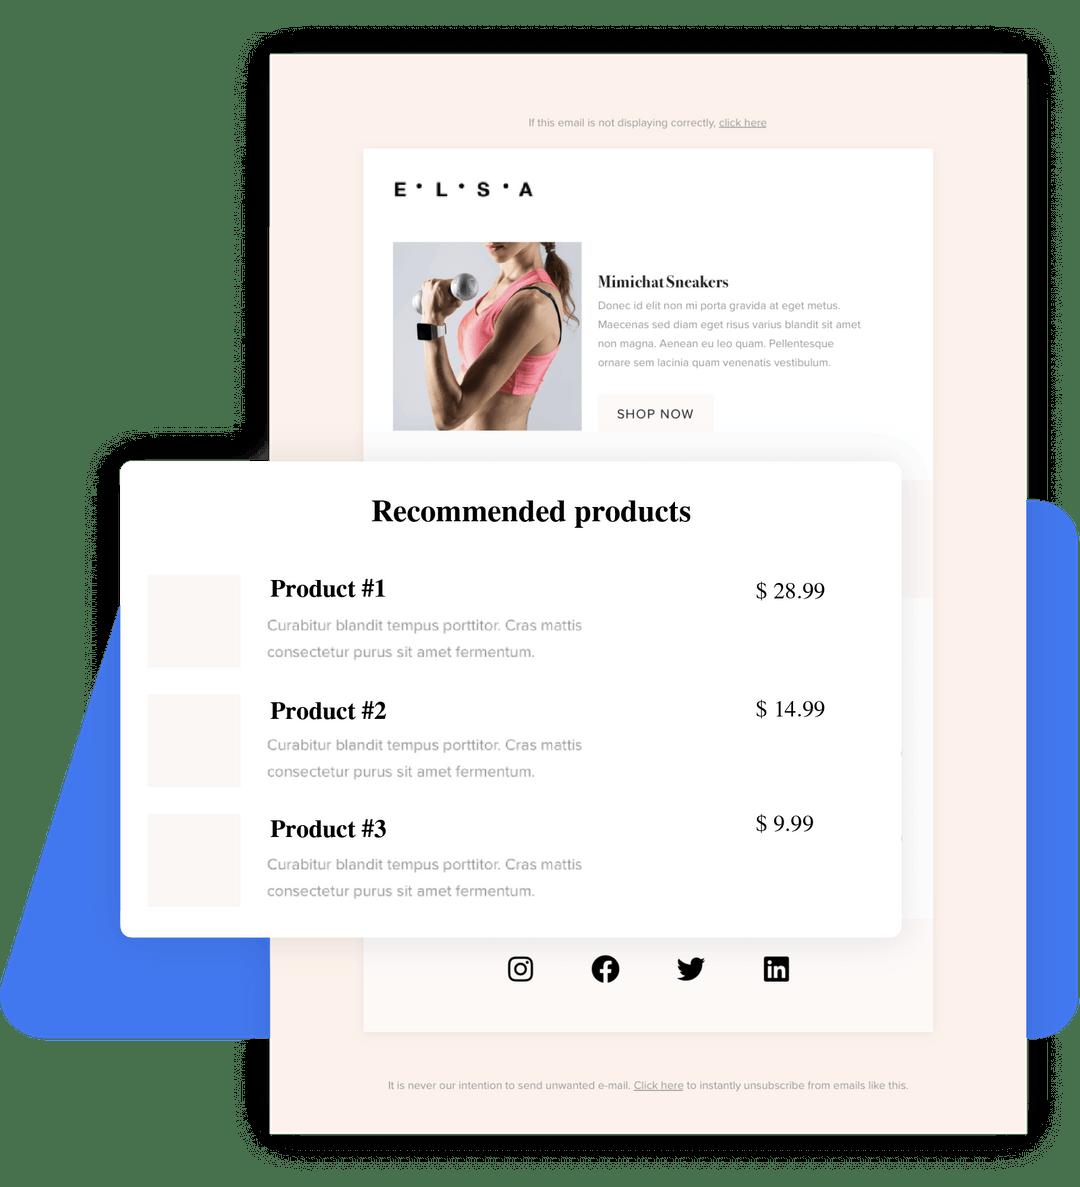 product-reccomendation-campaign-builder